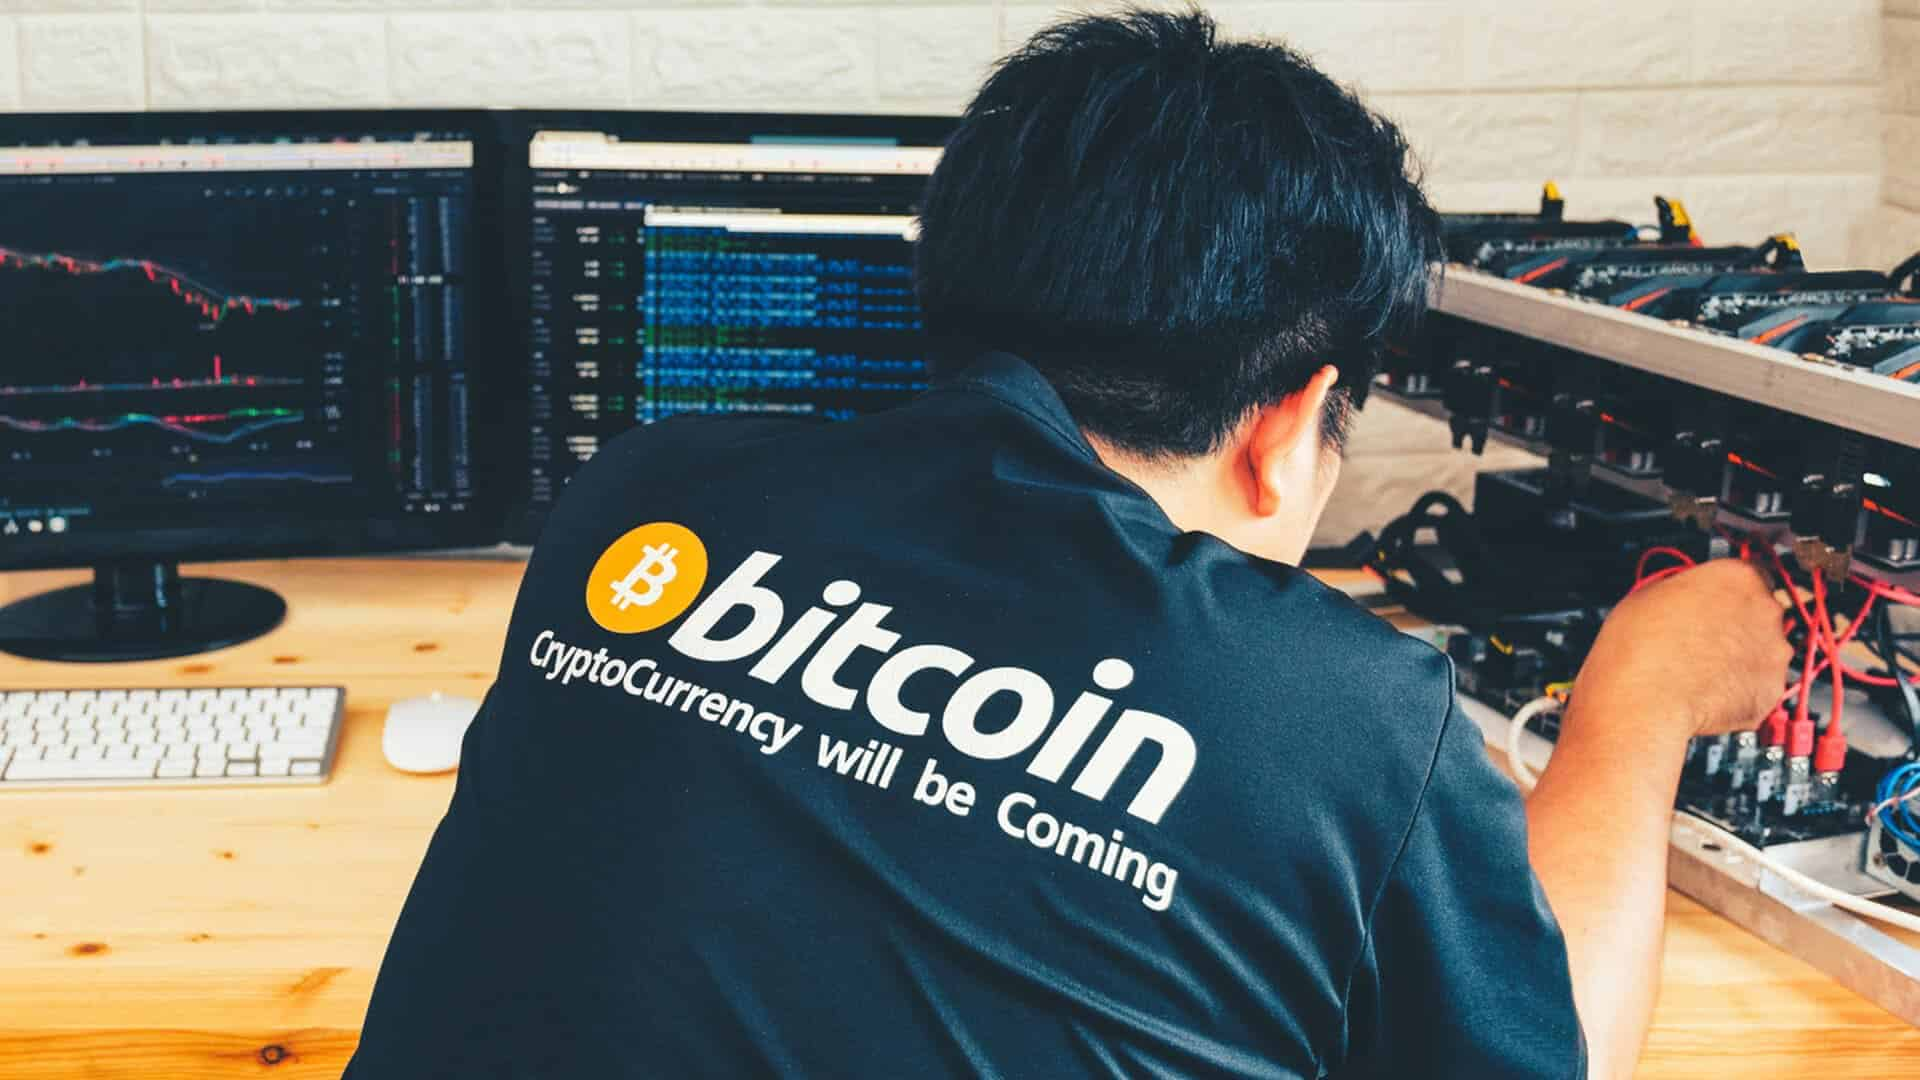 Mit Bitcoins zum Millionär?